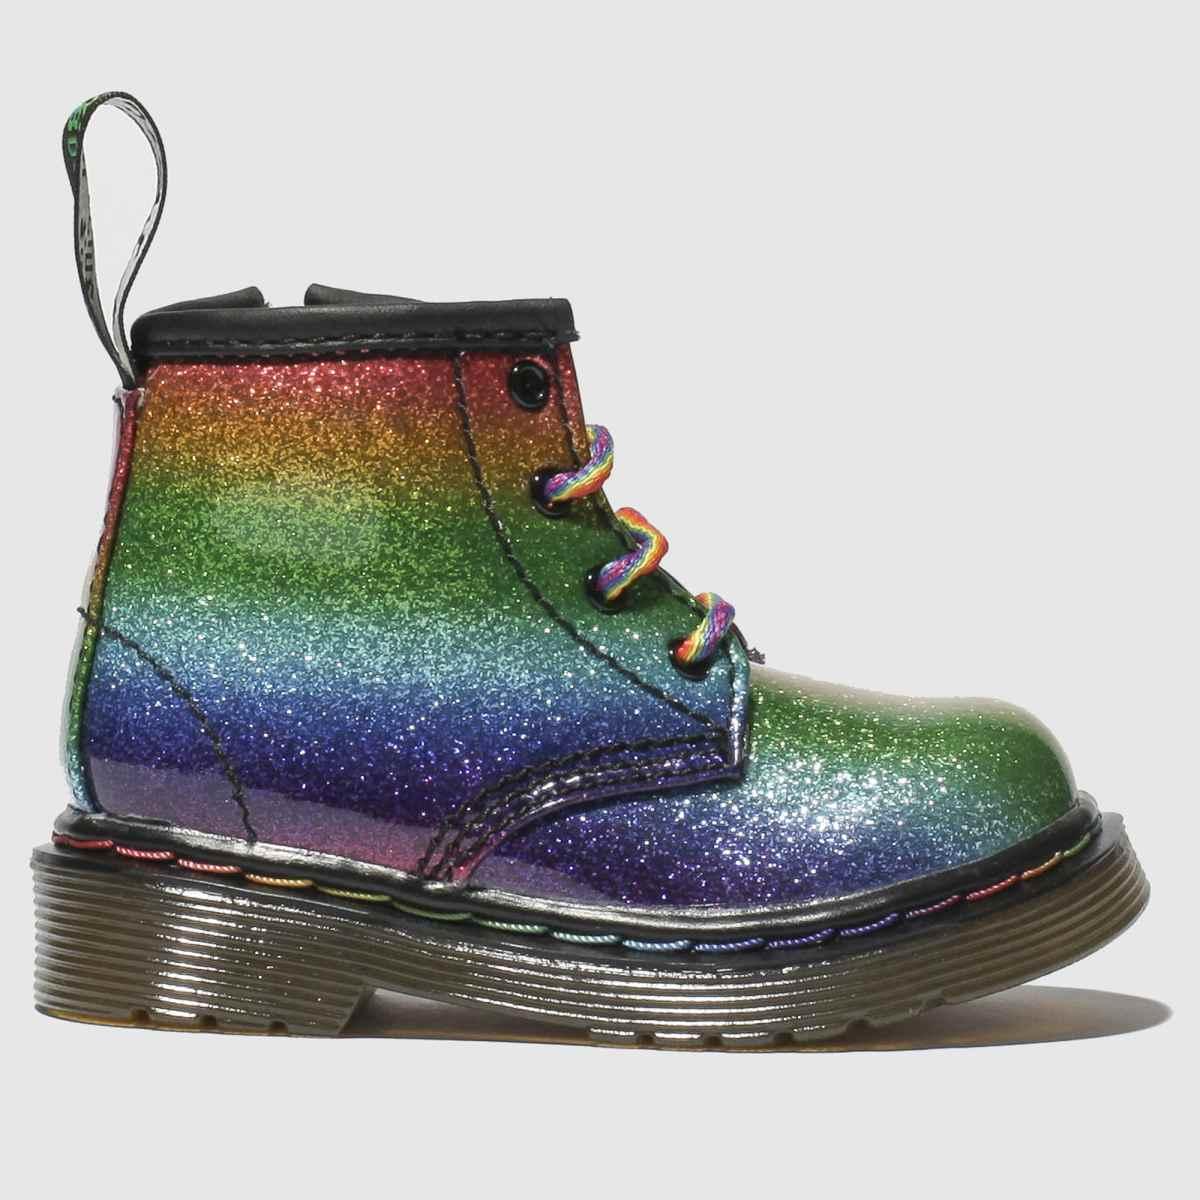 Dr Martens Green & Red 1460 Glitter Boots Toddler